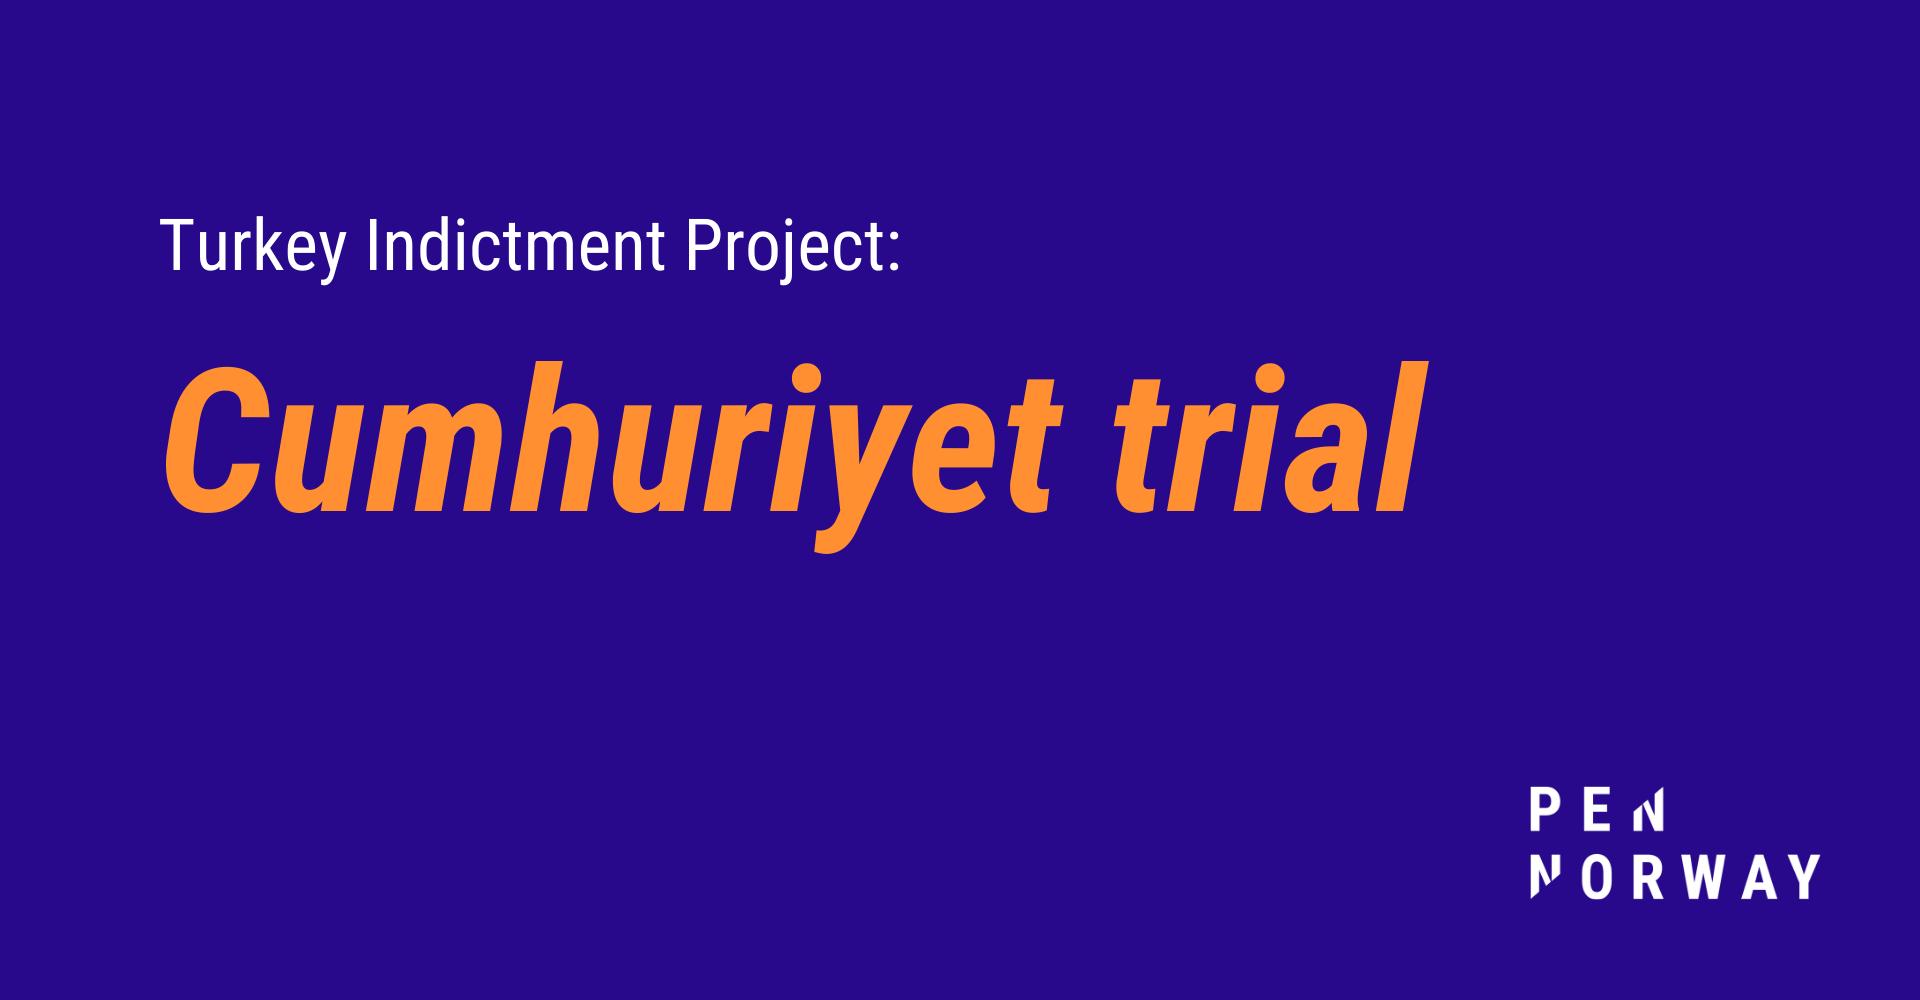 Turkey Indictment Project: Cumhuriyet trial